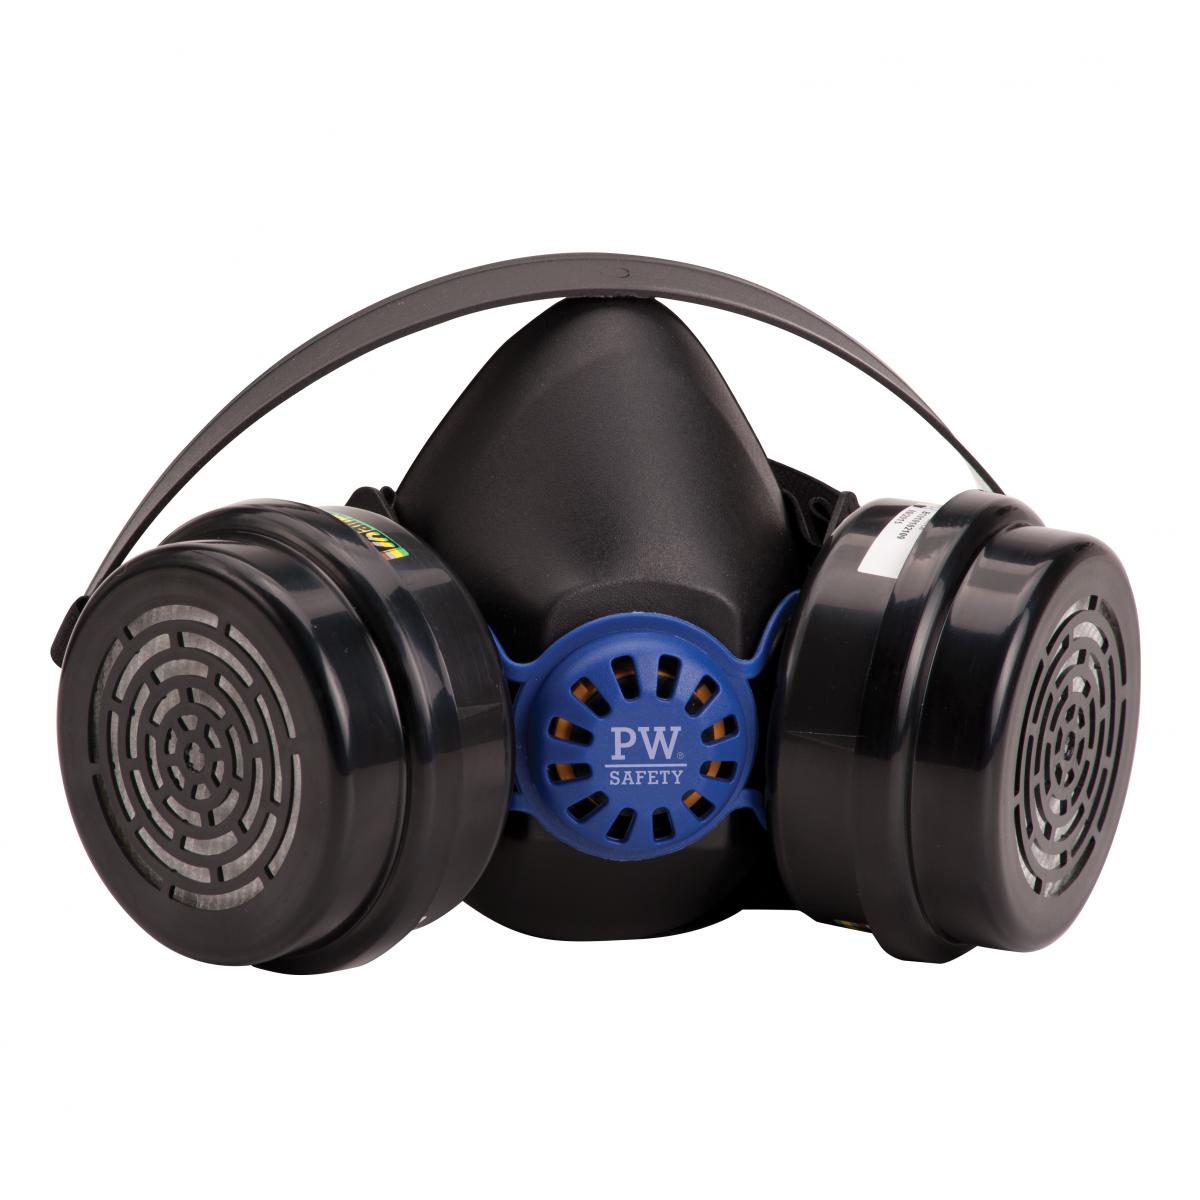 Atemschutz Halbmaske mit Bajonett-System